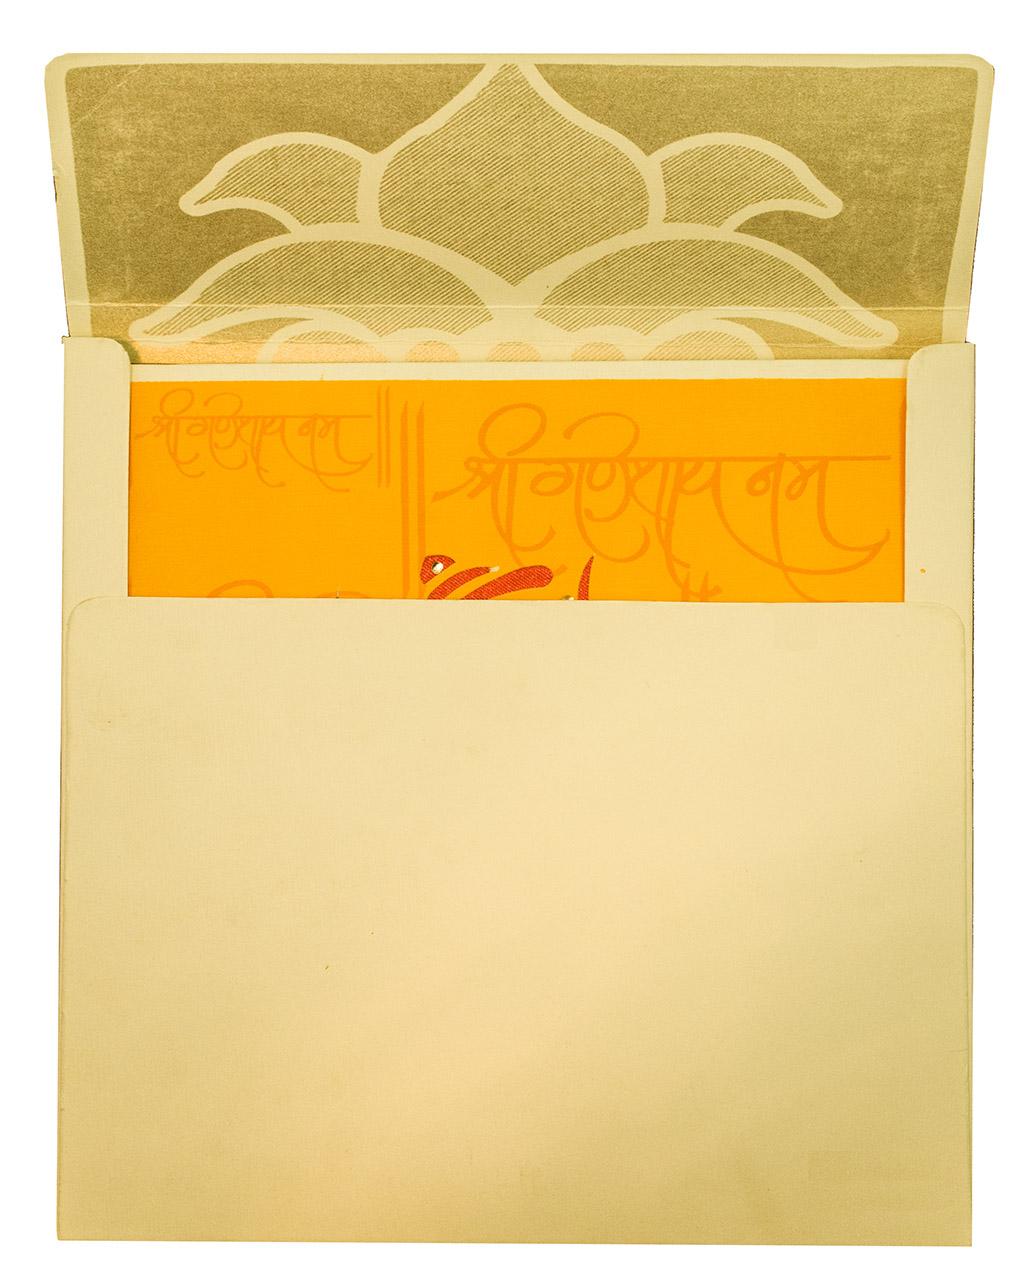 Sample Ganesha Themed Wedding Cards With Hindu Shlokas